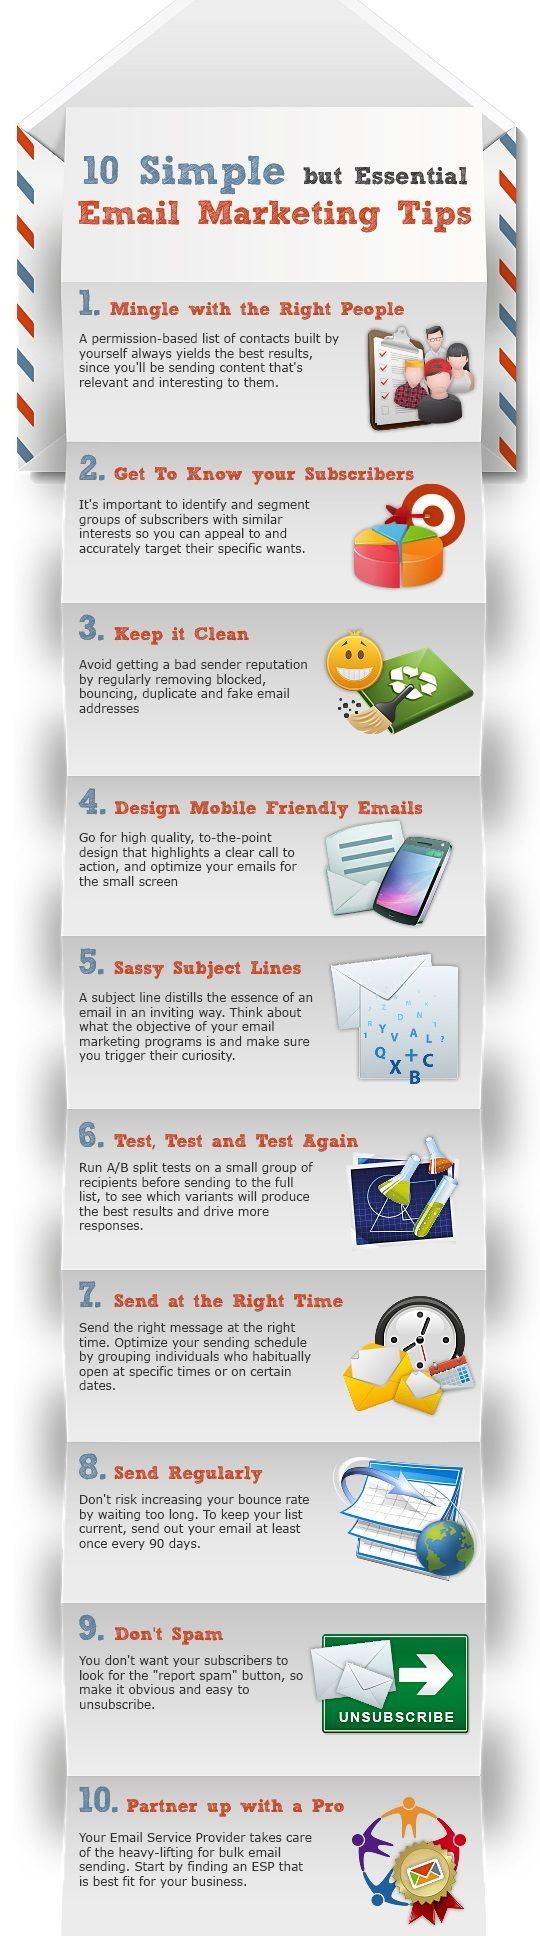 Email Marketing #infographic http://nextlevelinternetmarketing.com